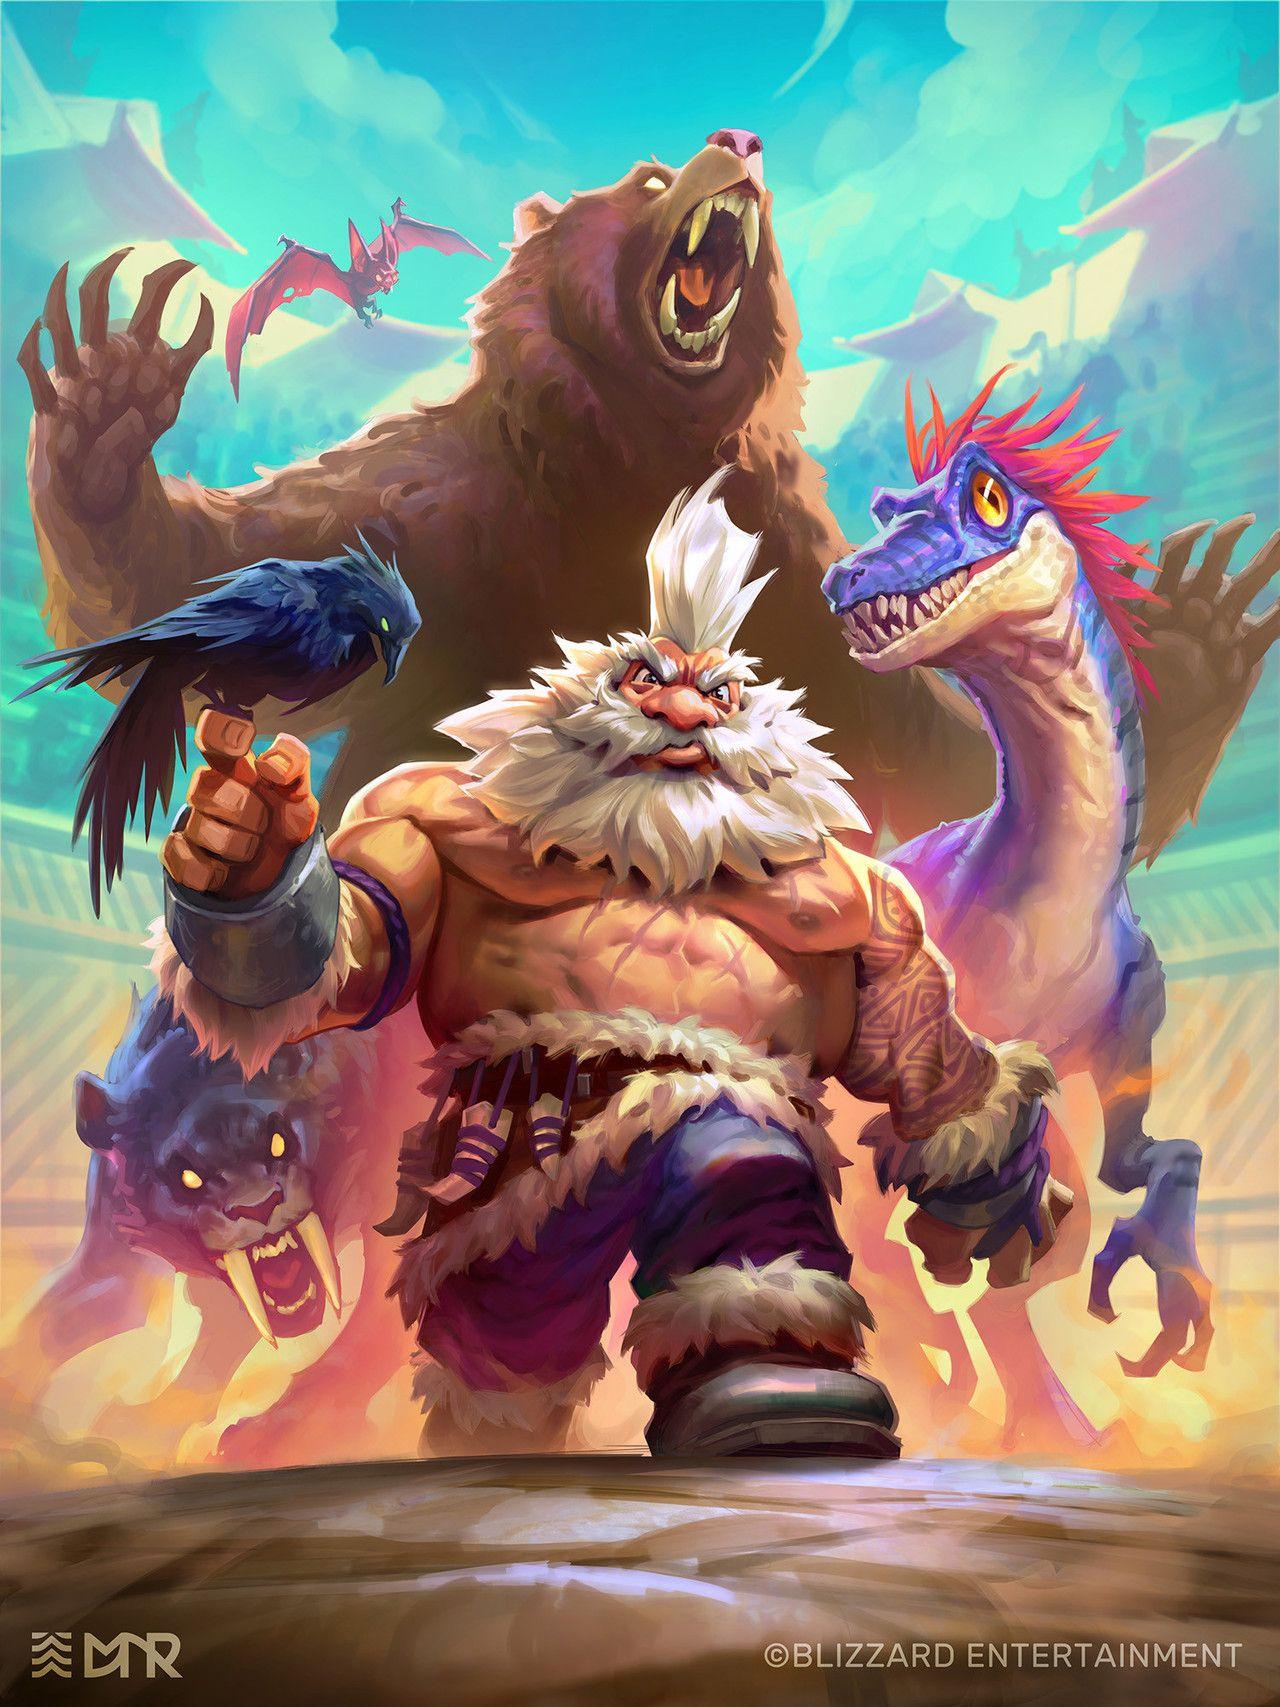 Man Male D D Pathfinder Dnd Shirtless Fantasy Dwarf Hunter